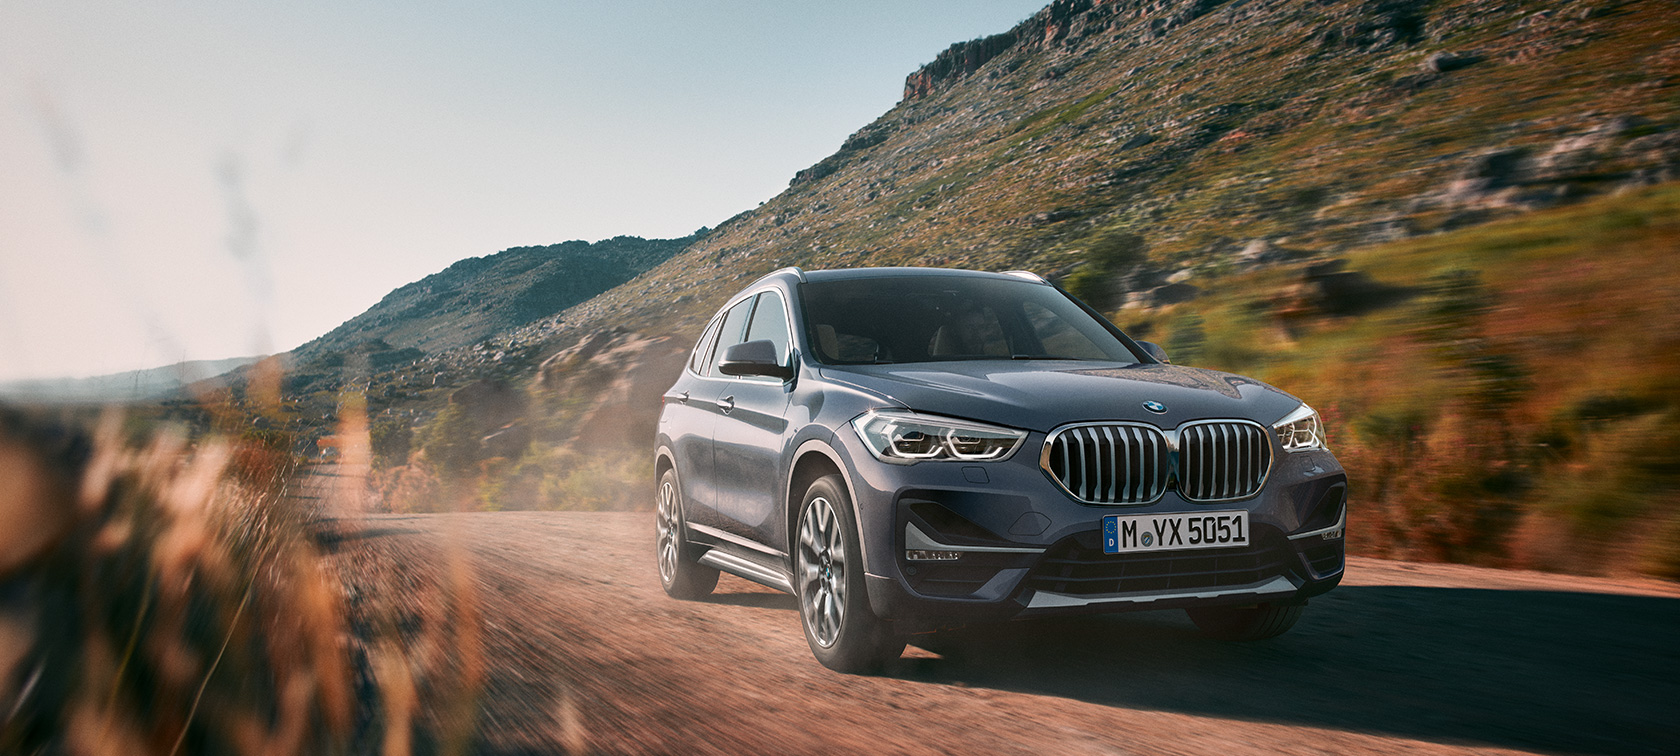 BMW X1: The flexible and dynamic SAV | BMW ca